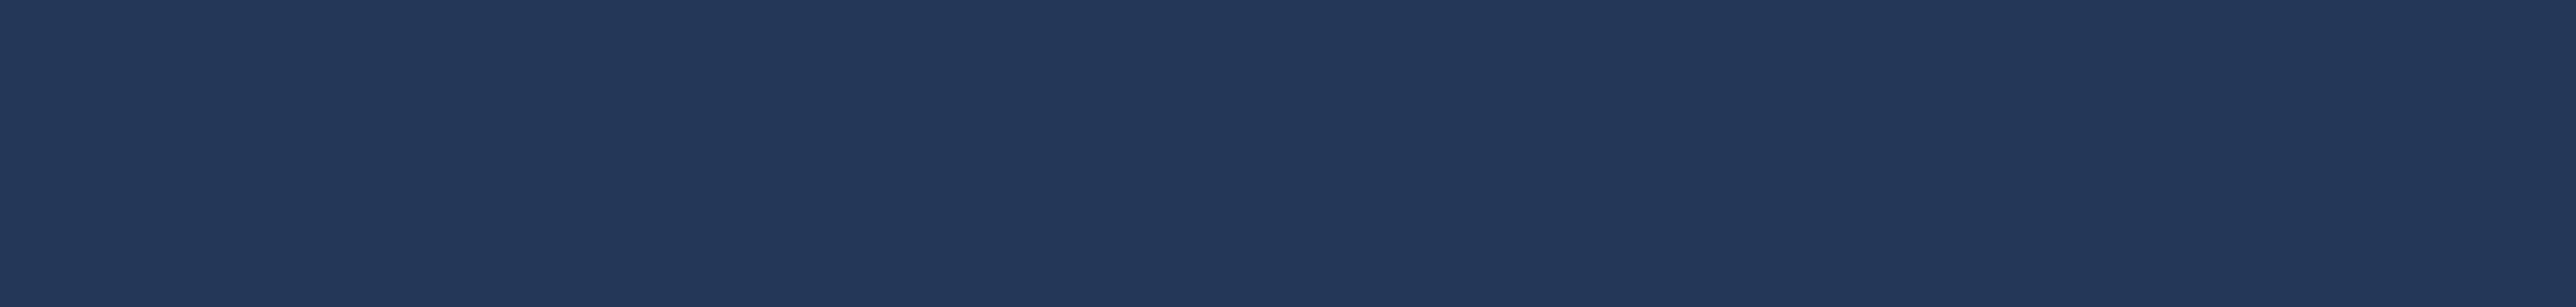 Logotipo da AppDynamics